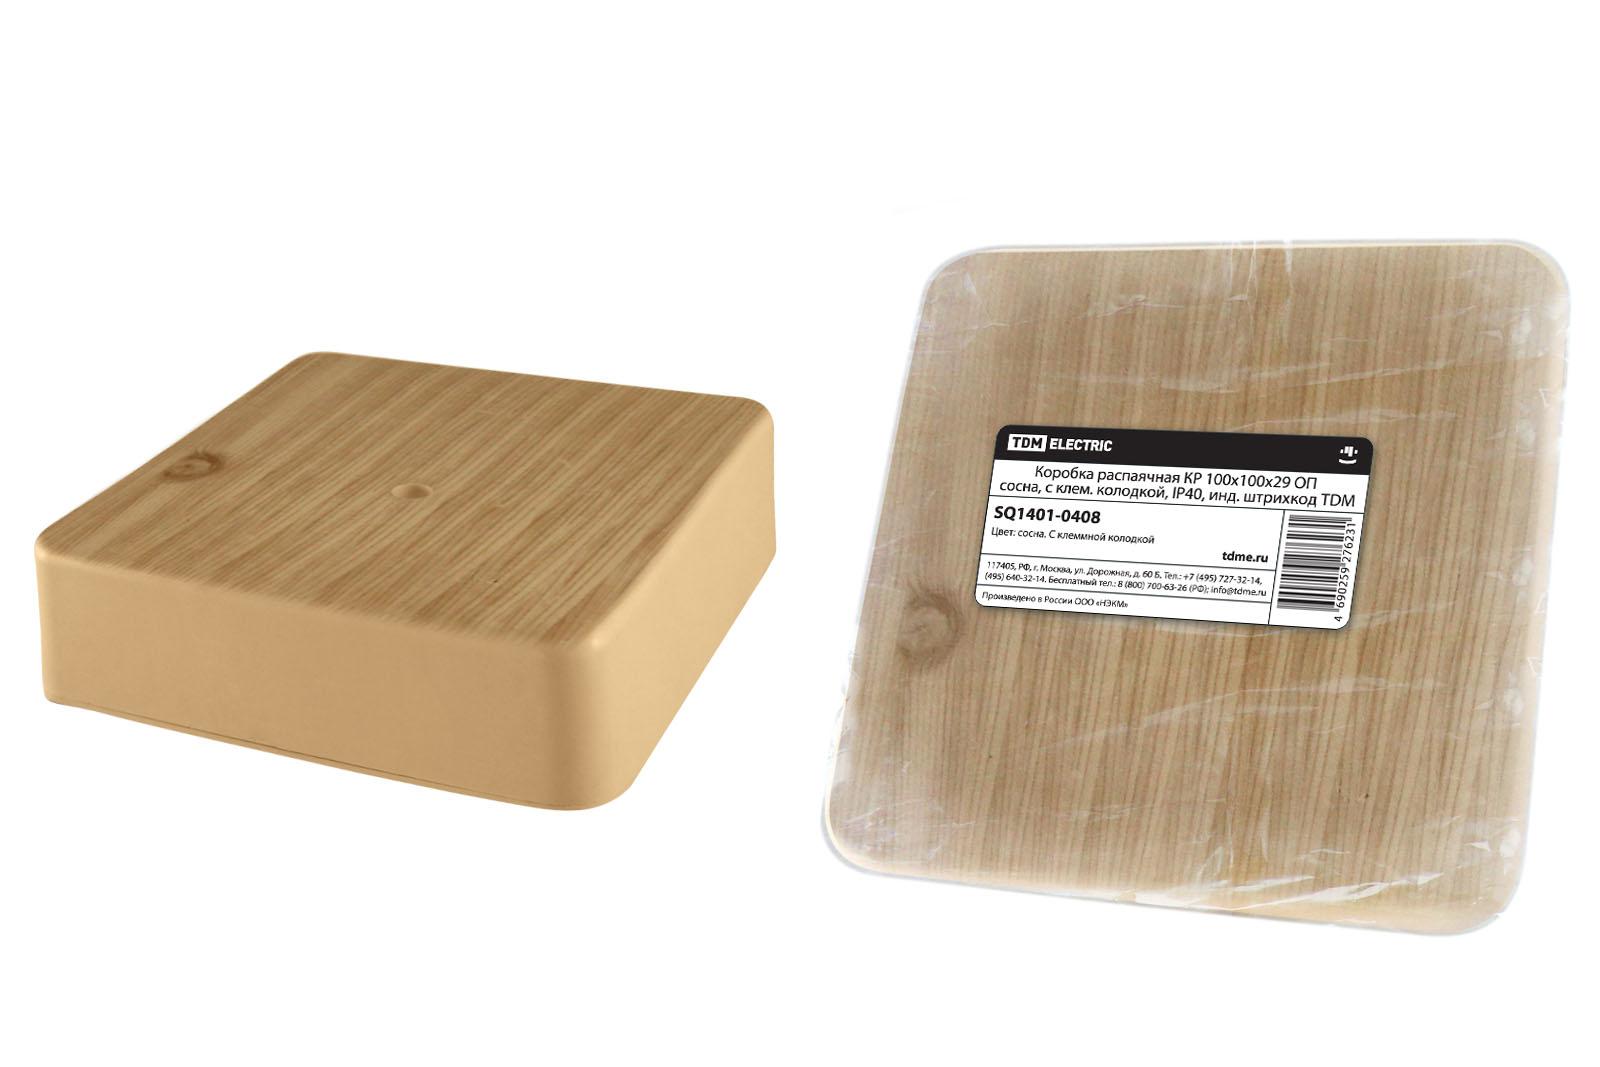 Фото Коробка распаячная КР 100х100х29 ОП сосна, с клем. колодкой, IP40, инд. штрихкод TDM {SQ1401-0408}